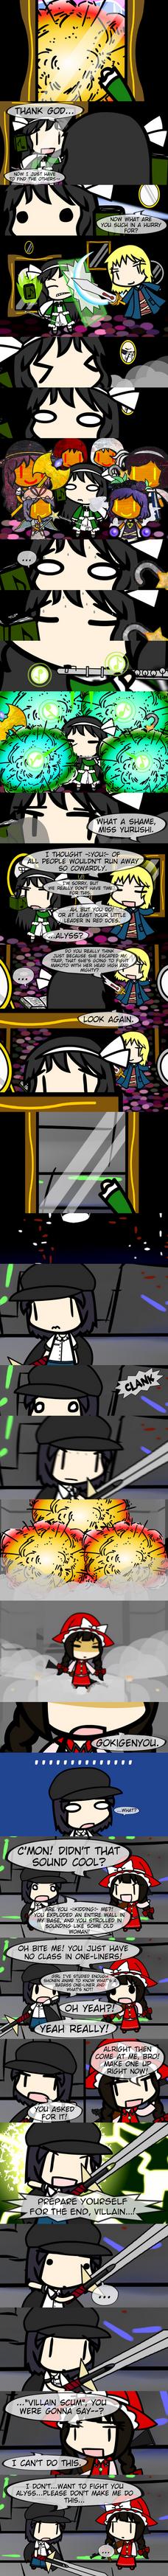 The Crossroad - Part 160 by Kigurou-Enkou